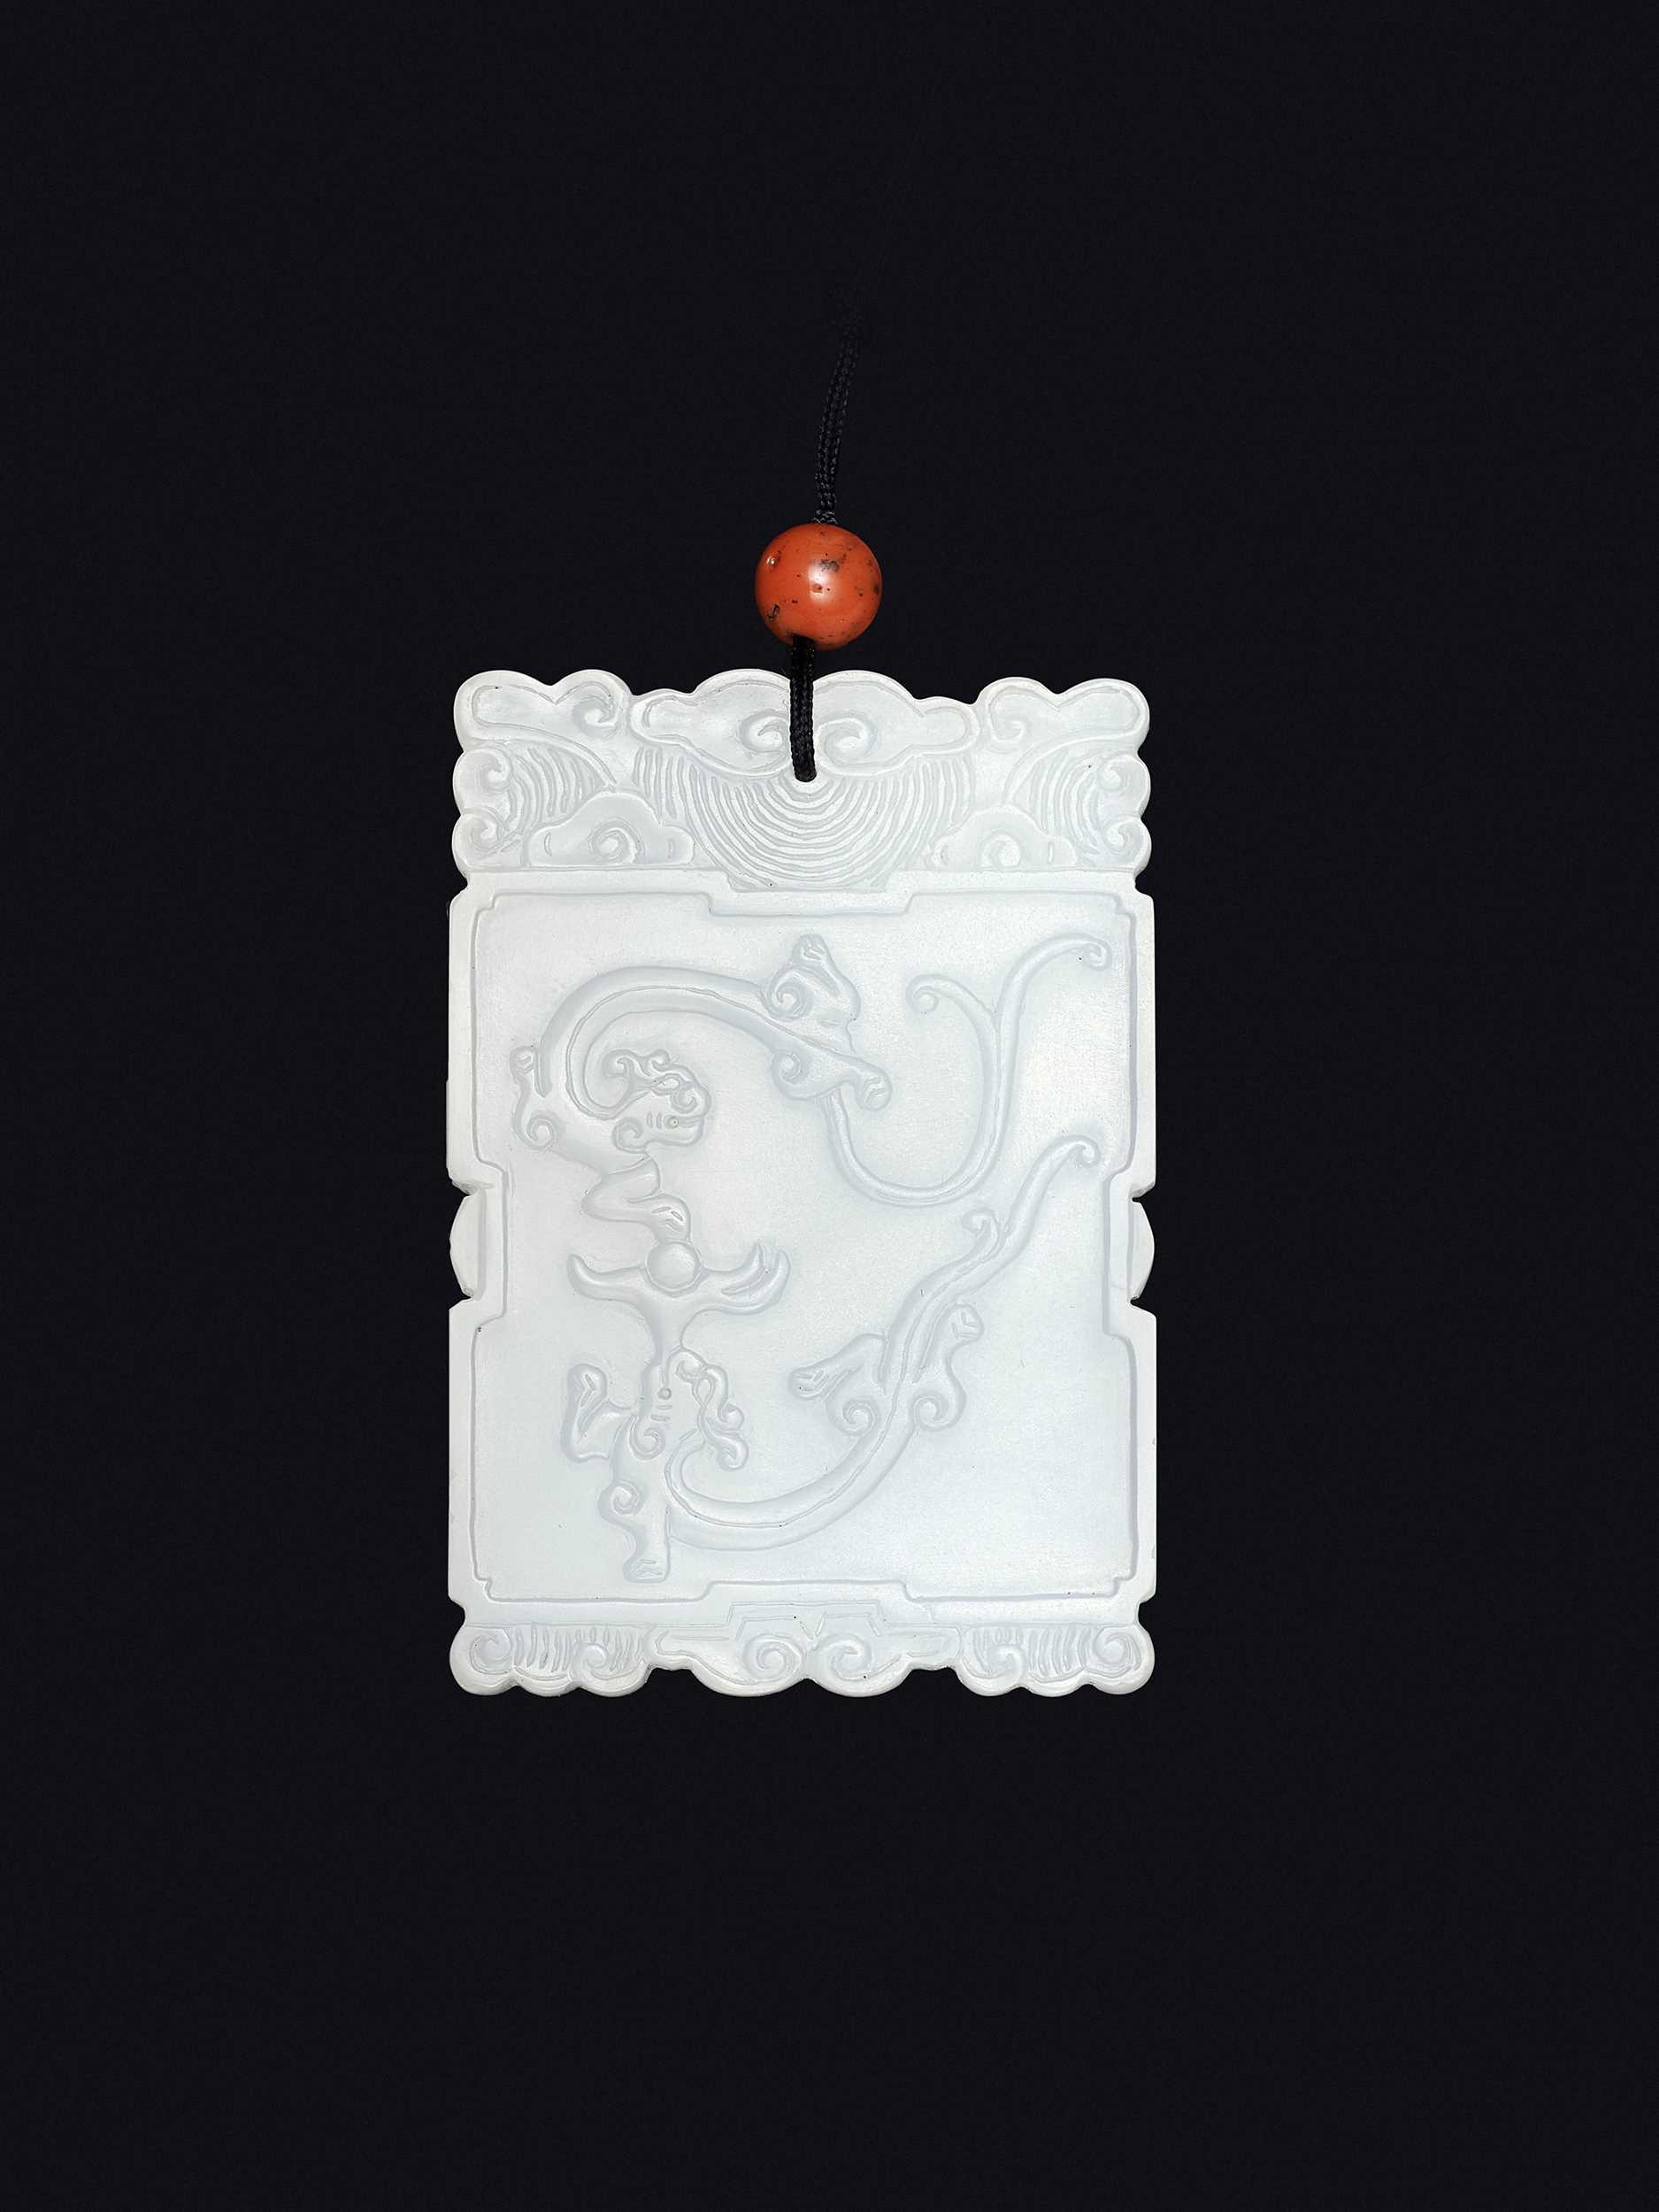 Lot 93 - A WHITE JADE 'FUGUI' PLAQUE, MID-QING TO REPUBLIC